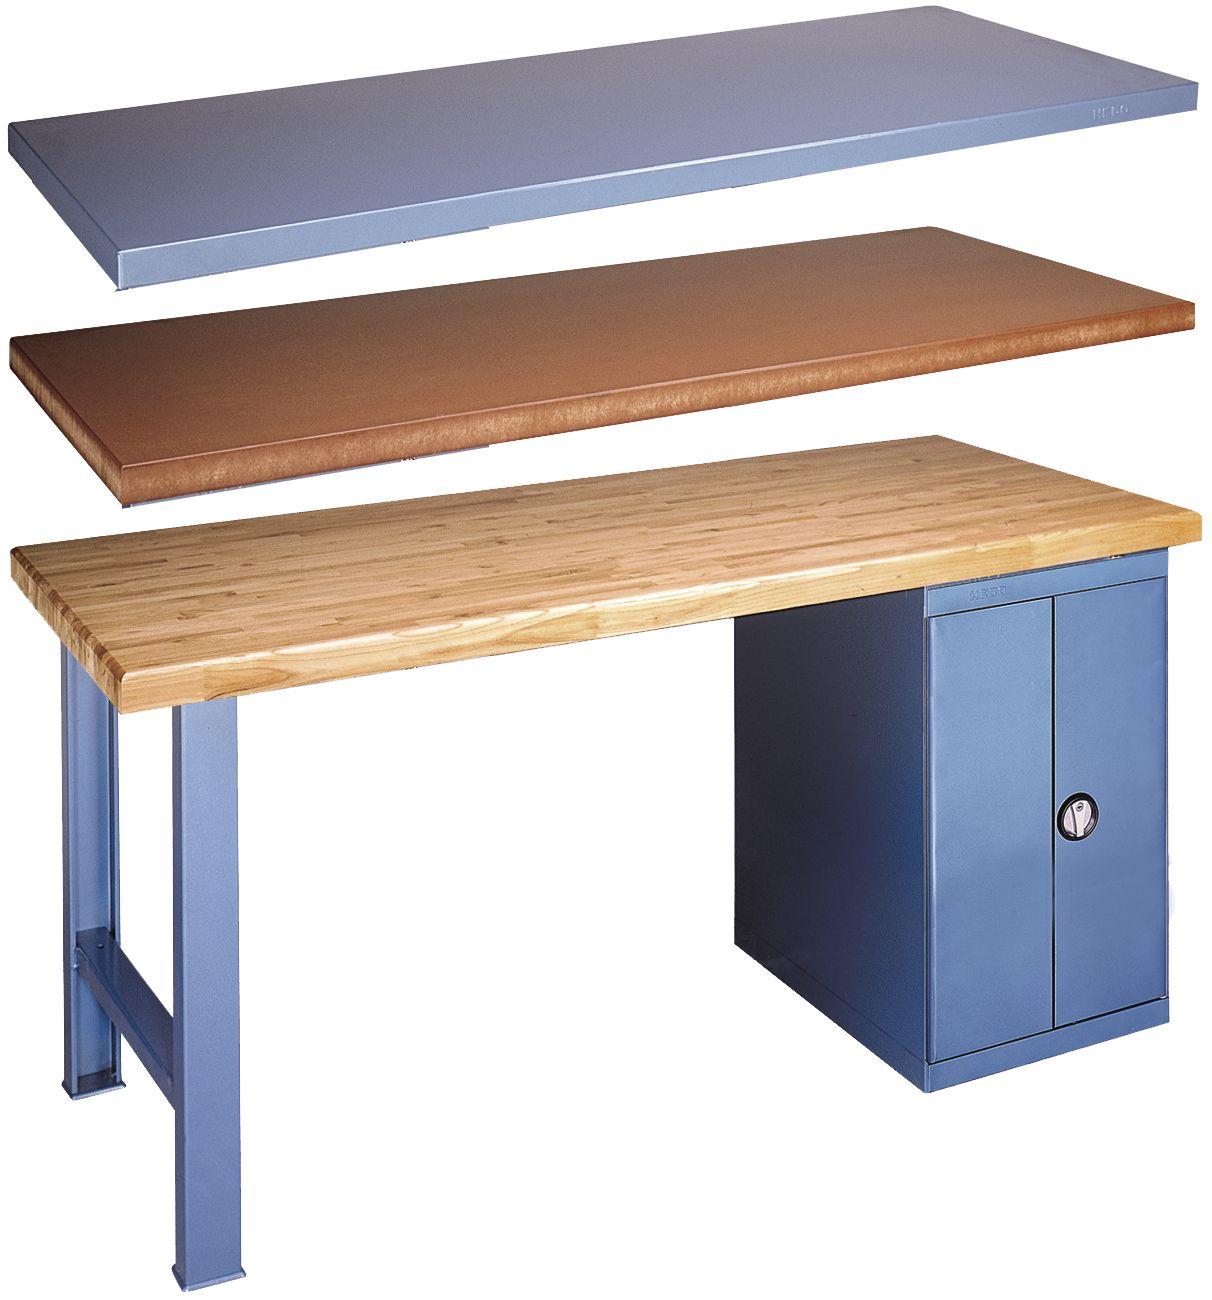 etabli etablis mobilier d 39 atelier torros. Black Bedroom Furniture Sets. Home Design Ideas